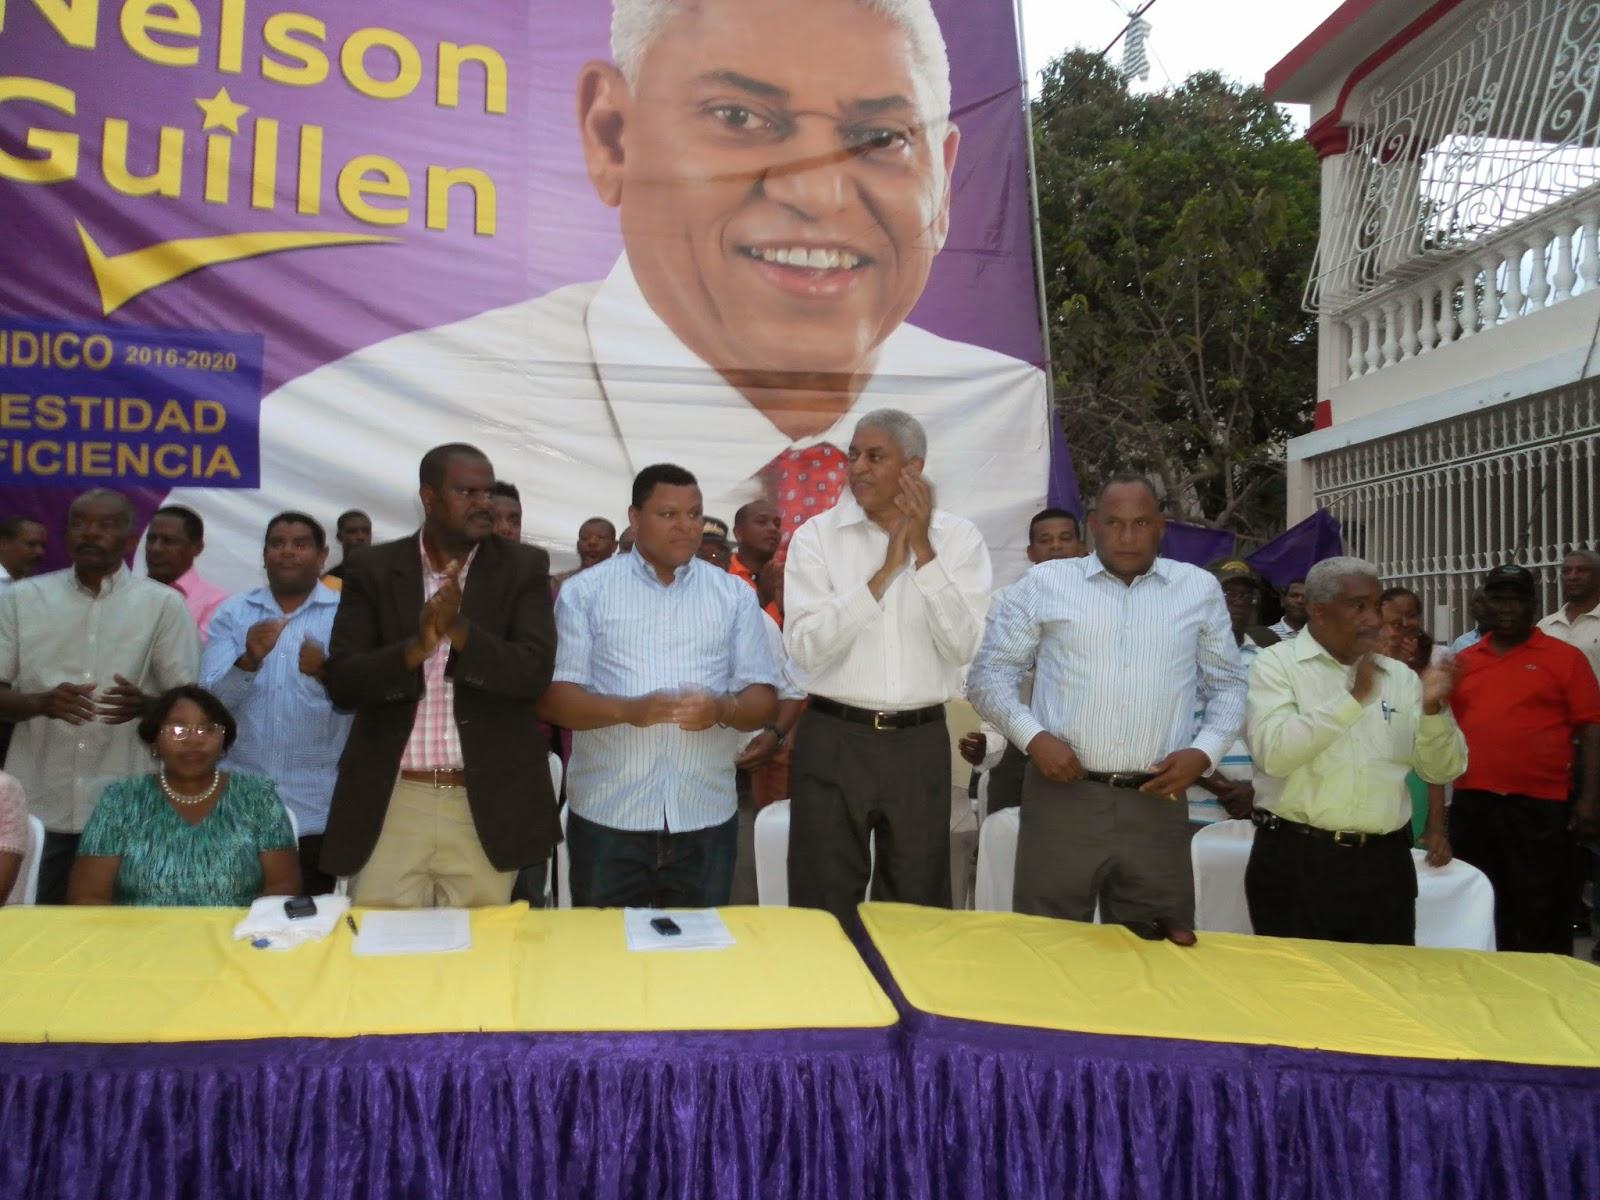 Nelson Guillén  recibe respaldo masivo en el sector de Canastica en San Cristóbal